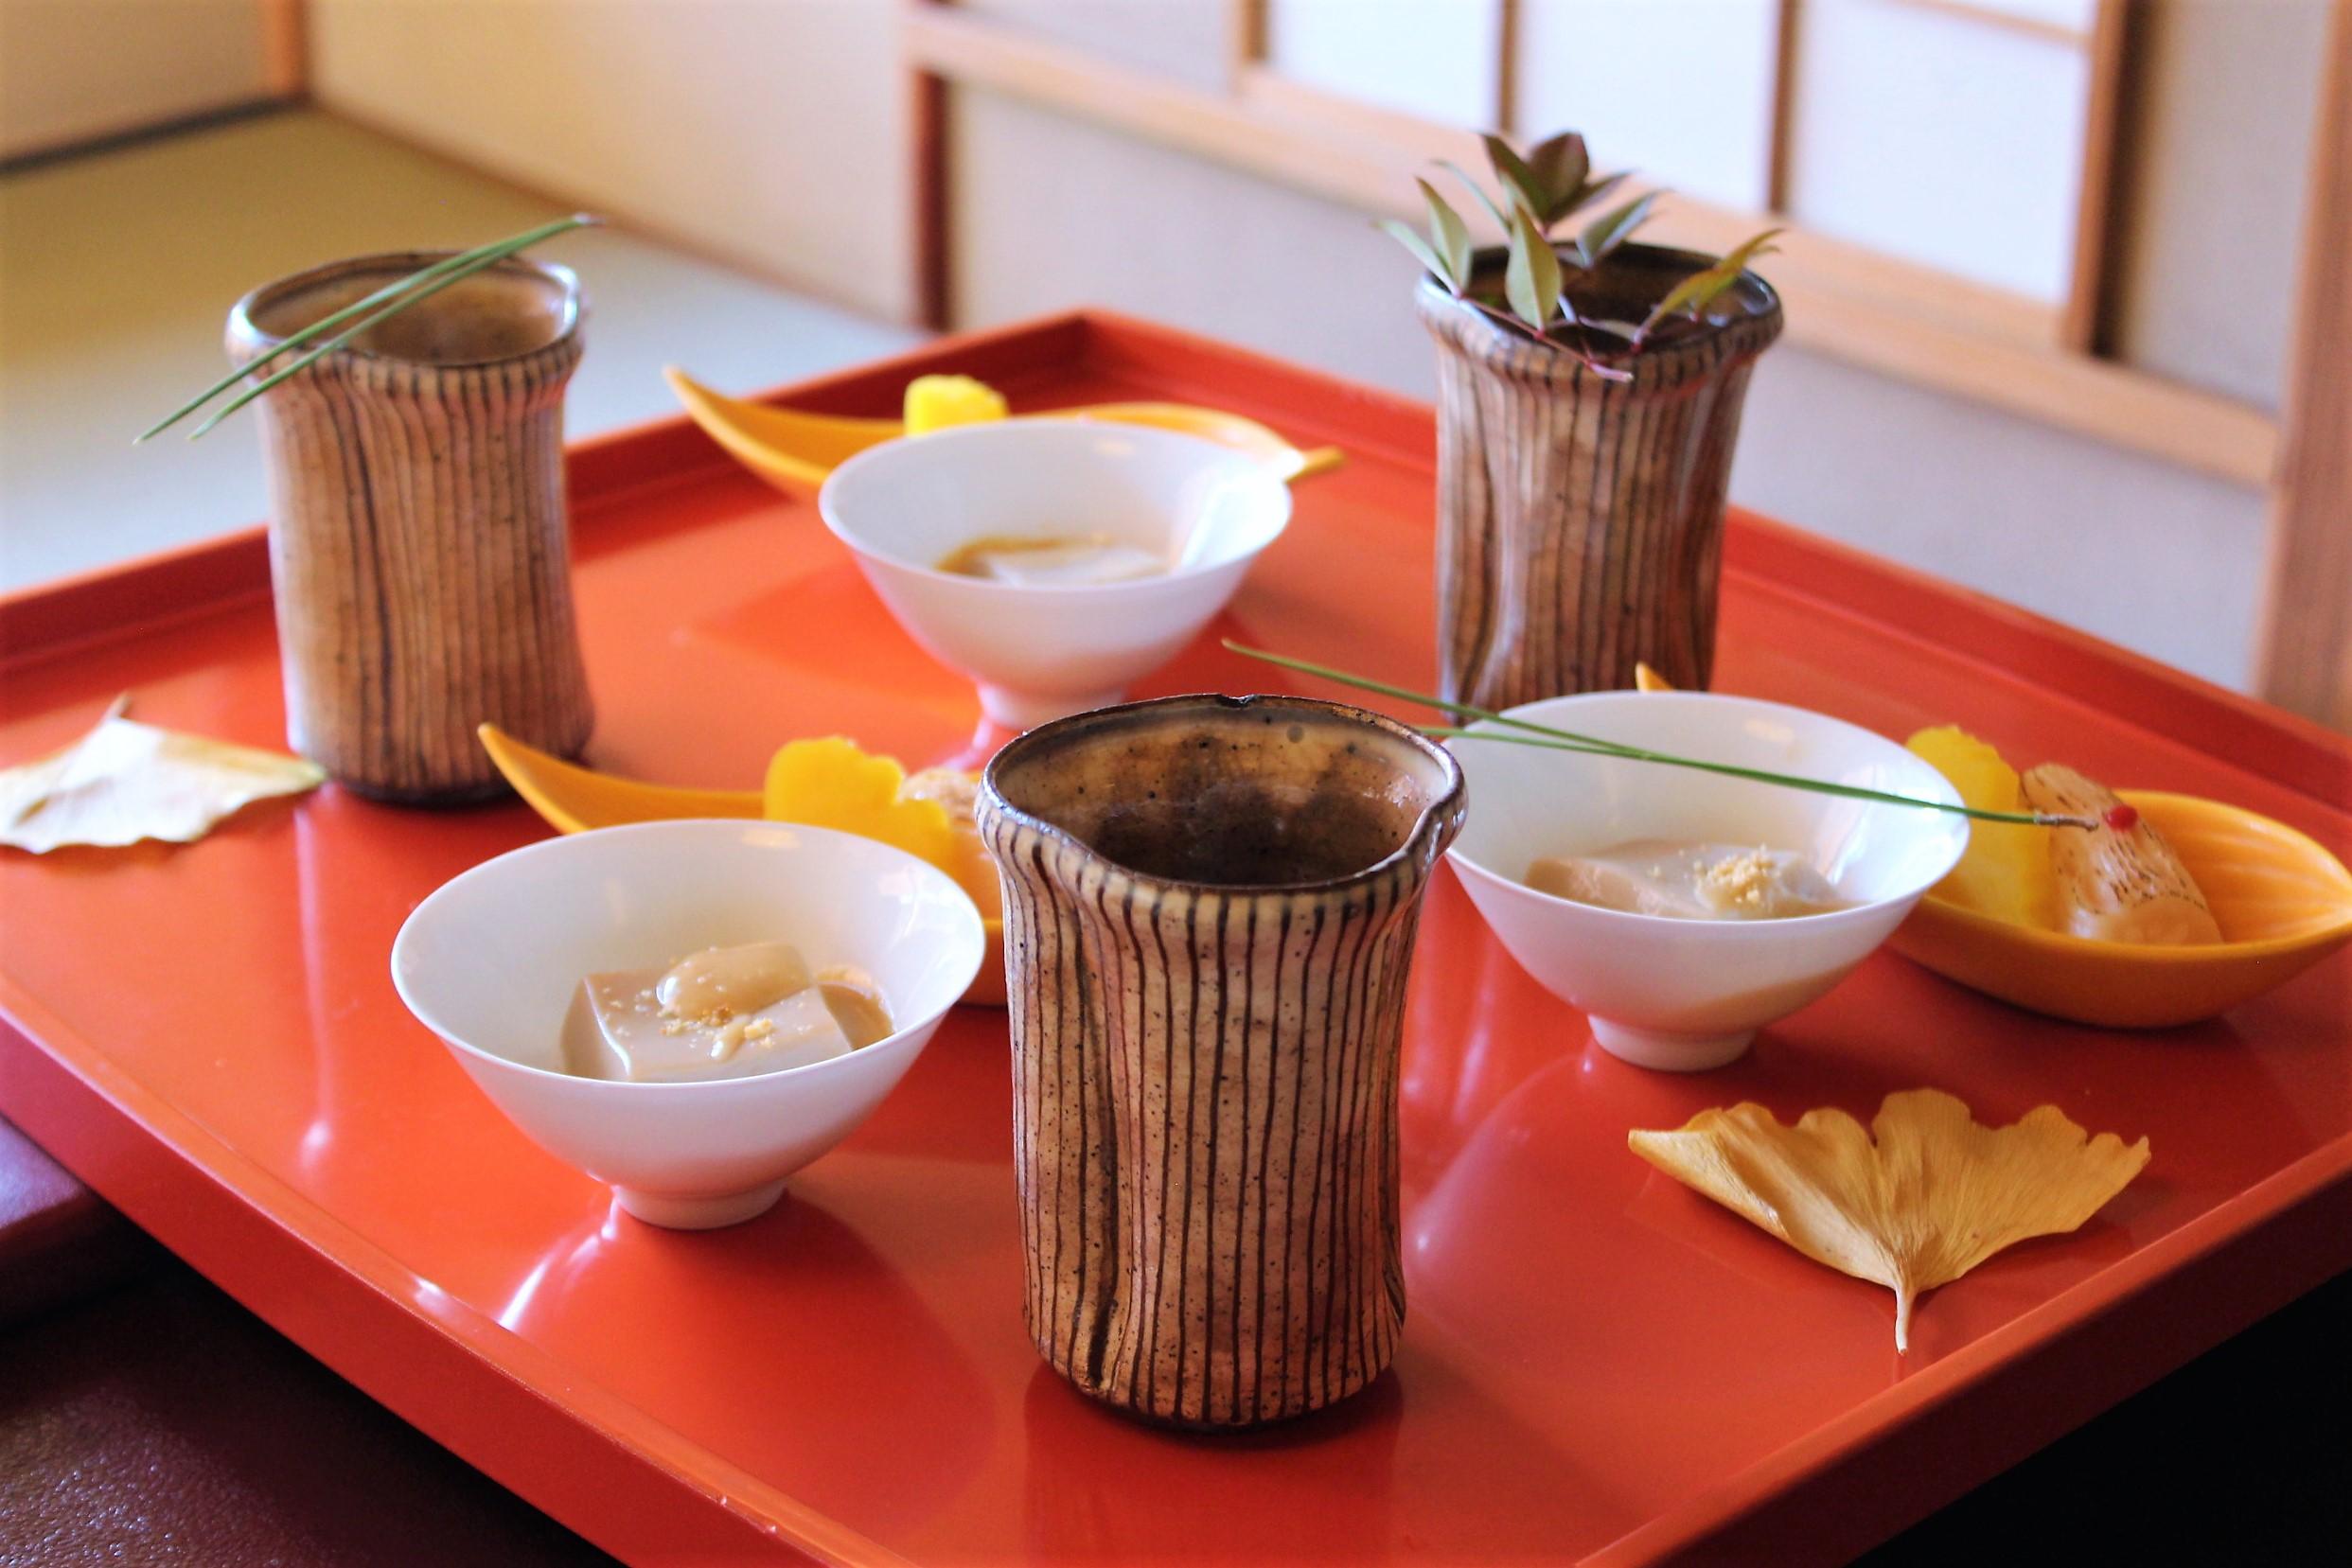 Peanut Tofu, Mushroom and Vegetables, Scallop Sushi at Tokyo Shiba Tofuya Ukai in Tokyo, Japan